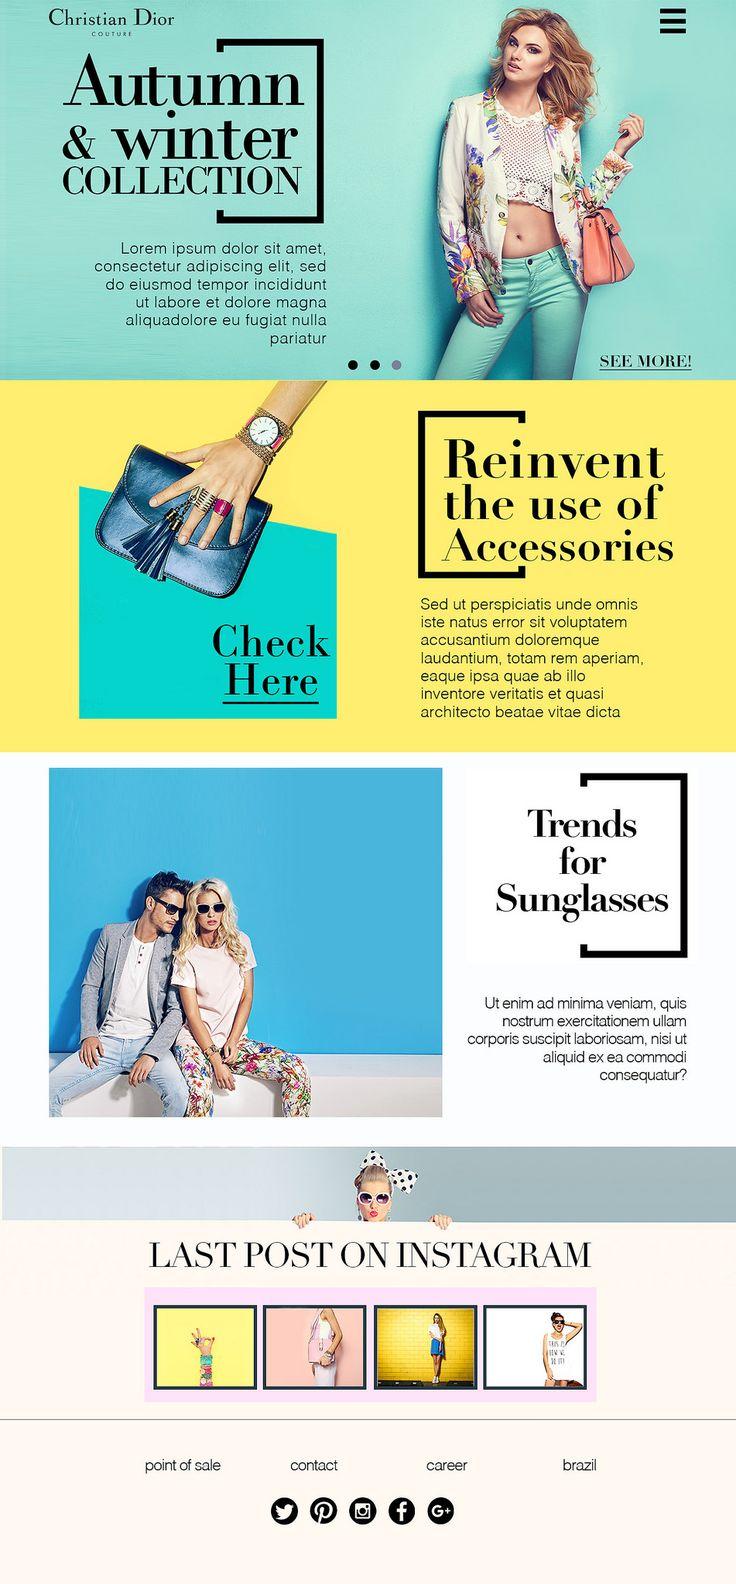 https://flic.kr/p/ToATNH   Rebranding Dior   Proposta de Templatepara o site da marca Christian Dior.